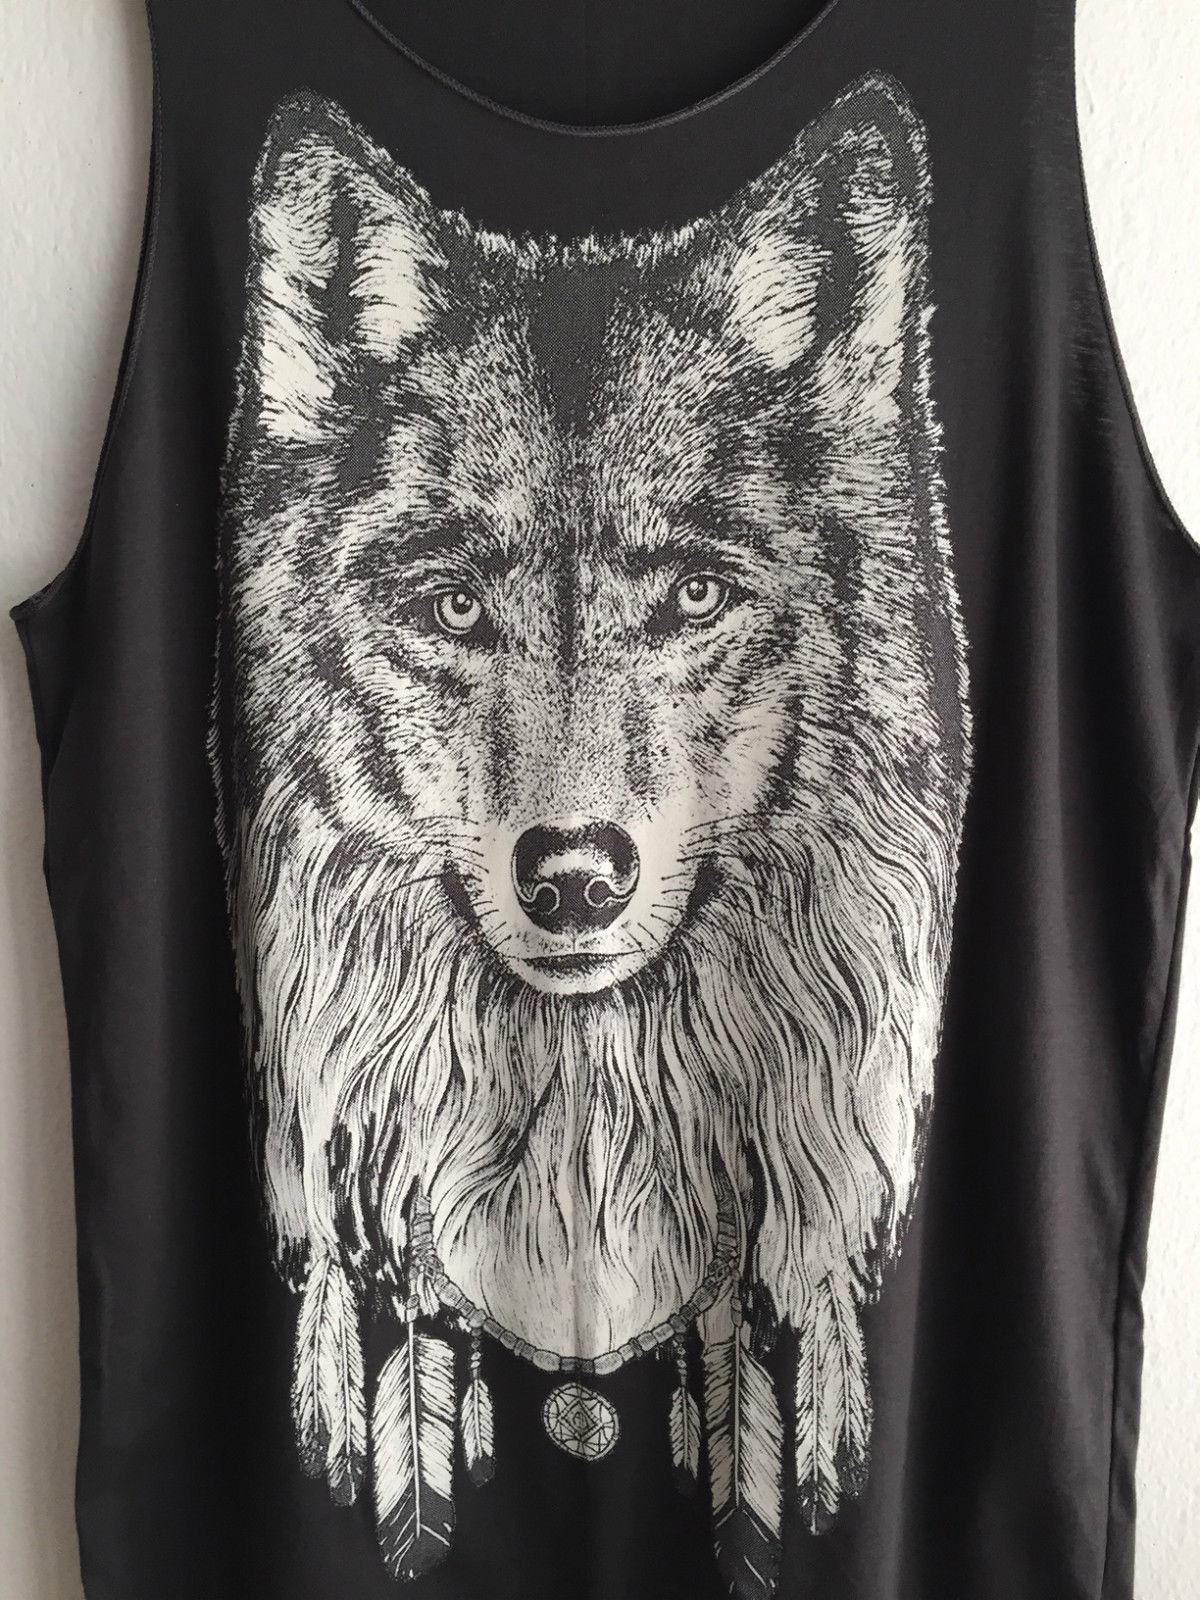 fox_wolf_wild_animal_pop_rock_fashion_vest_tank_top_tanks_tops_and_camis_4.JPG